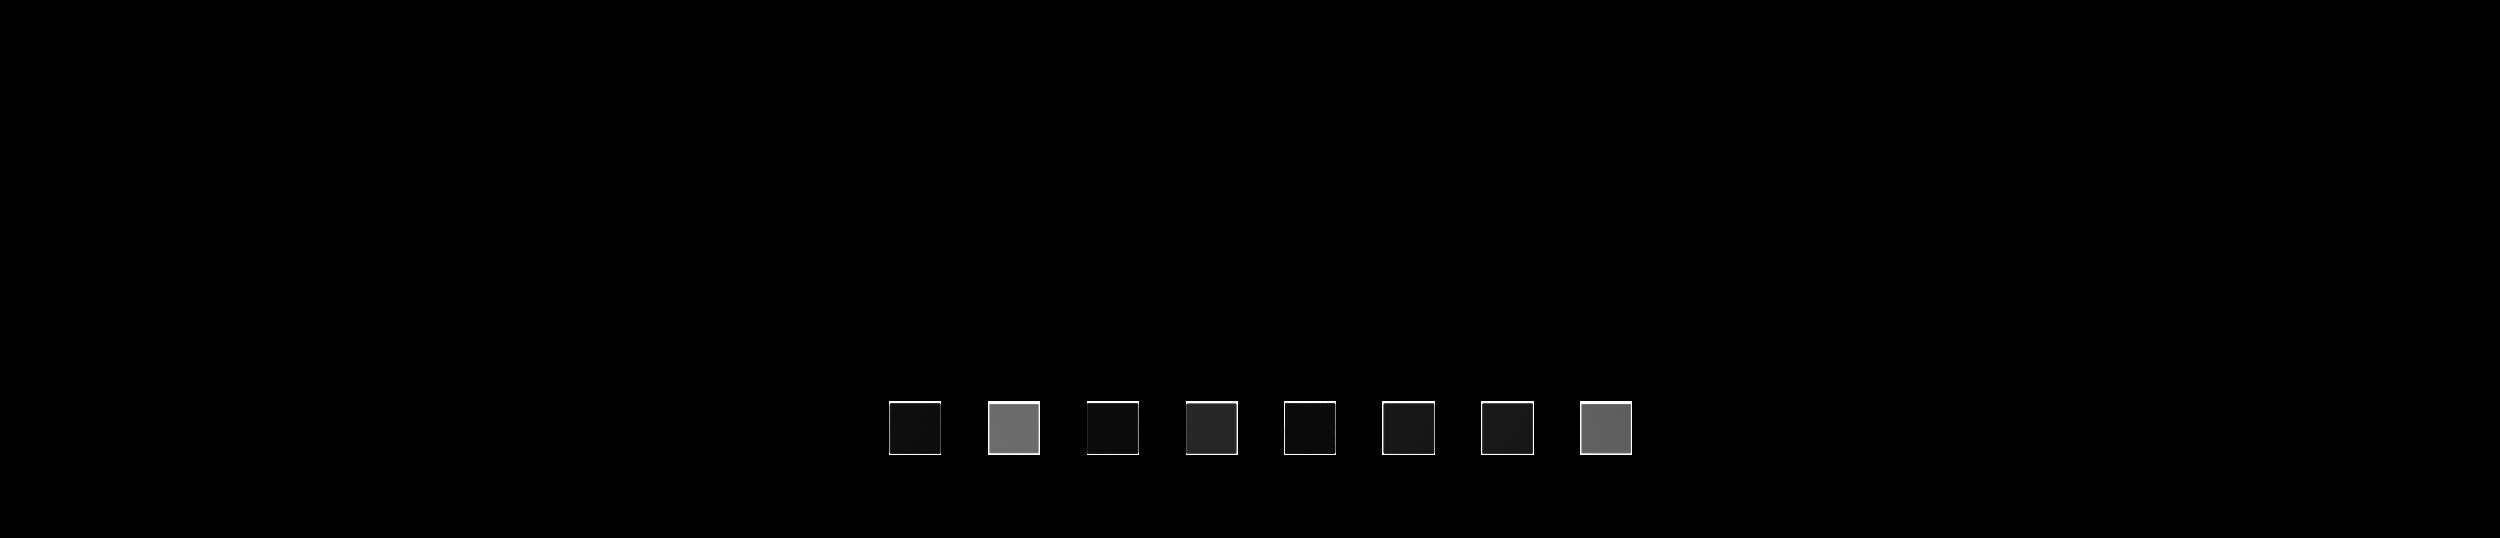 Logos Press-13.png